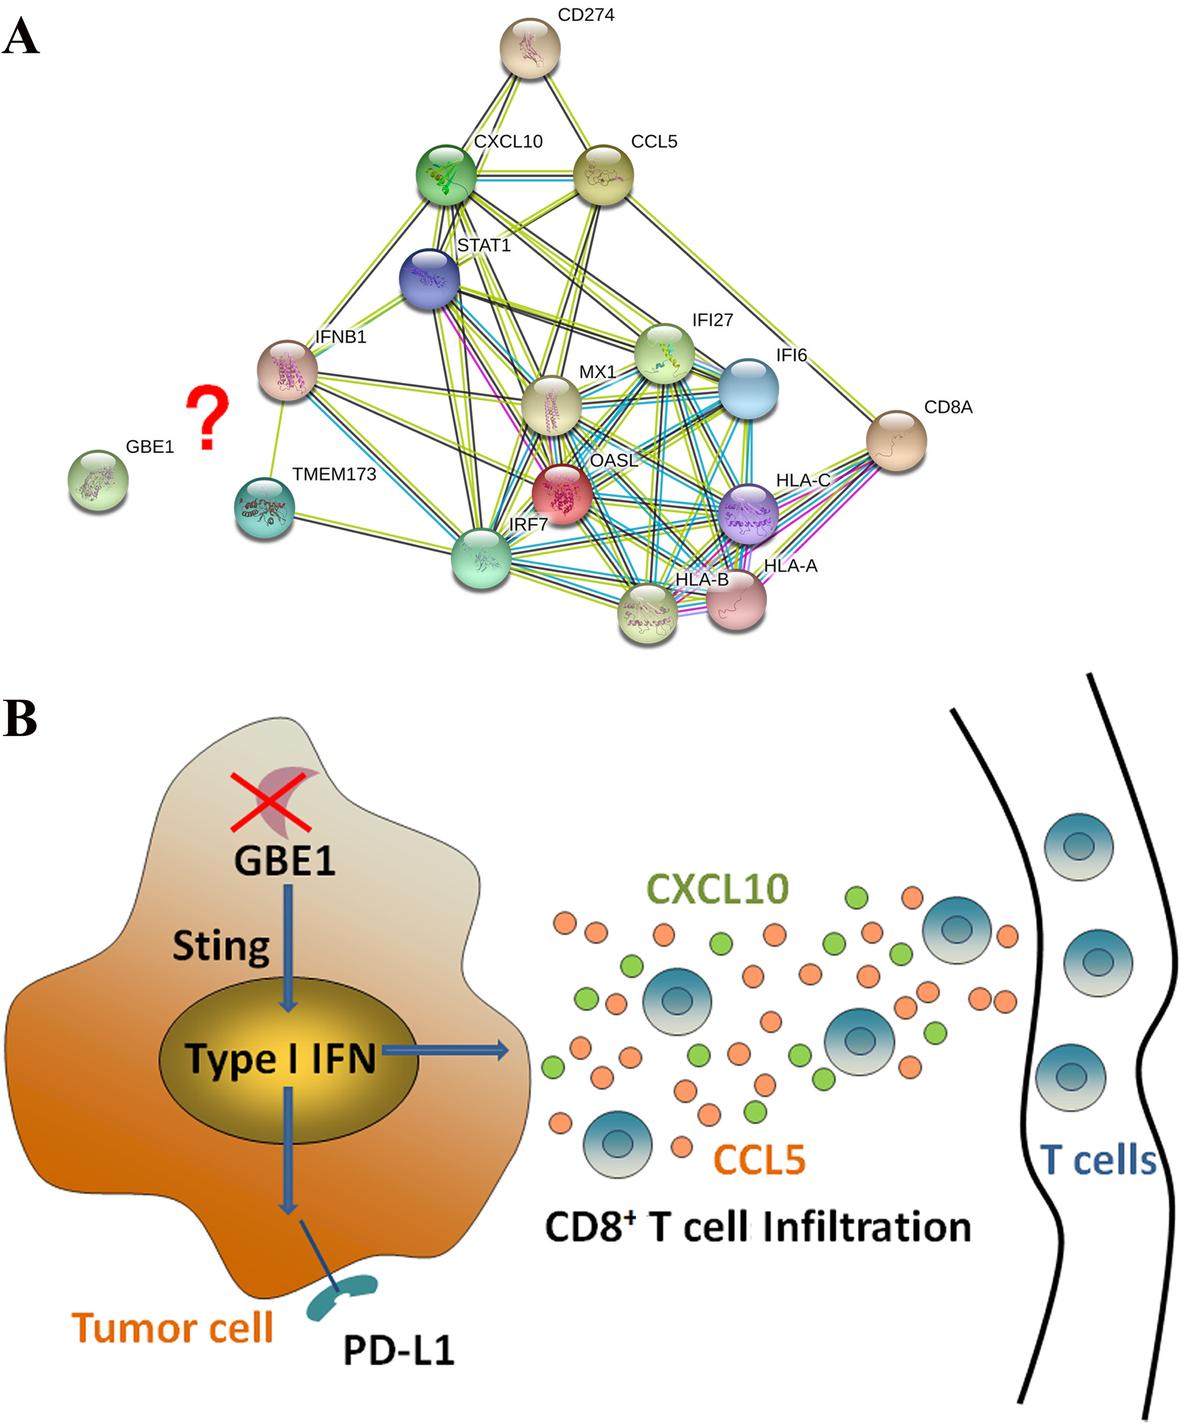 Lung Adenocarcinoma-intrinsic GBE1 Signaling Inhibits Anti